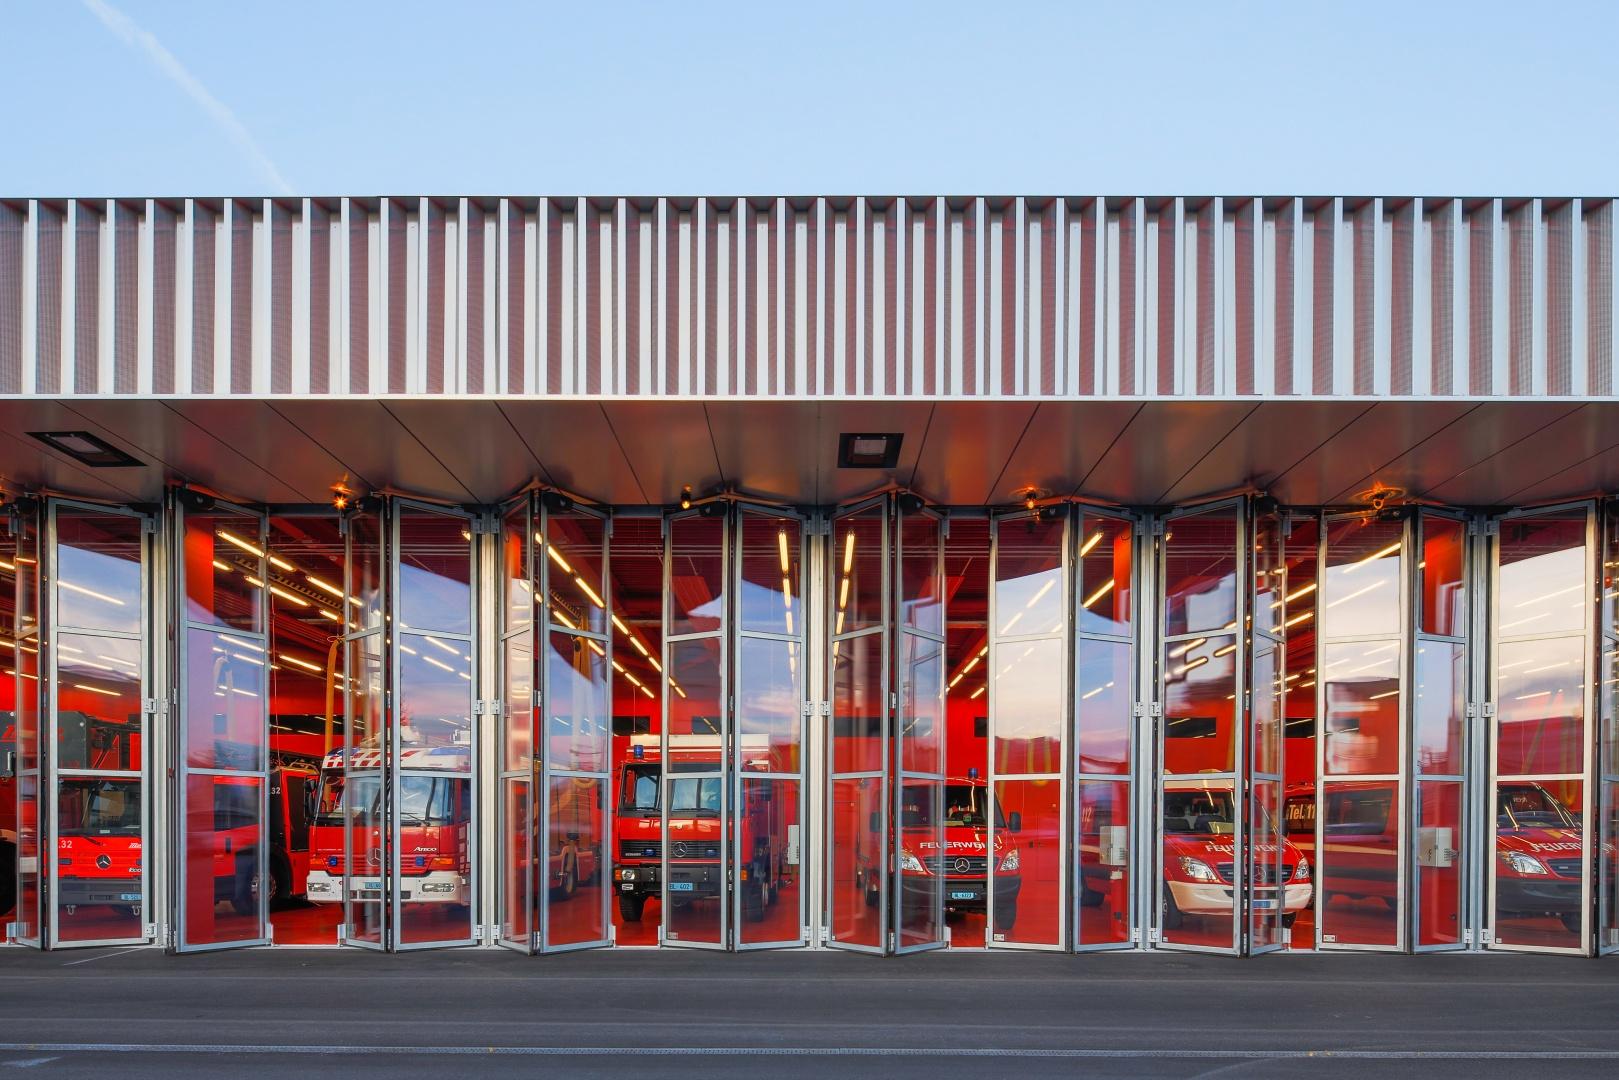 Tore Fahrzeughalle © Radek Brunecky